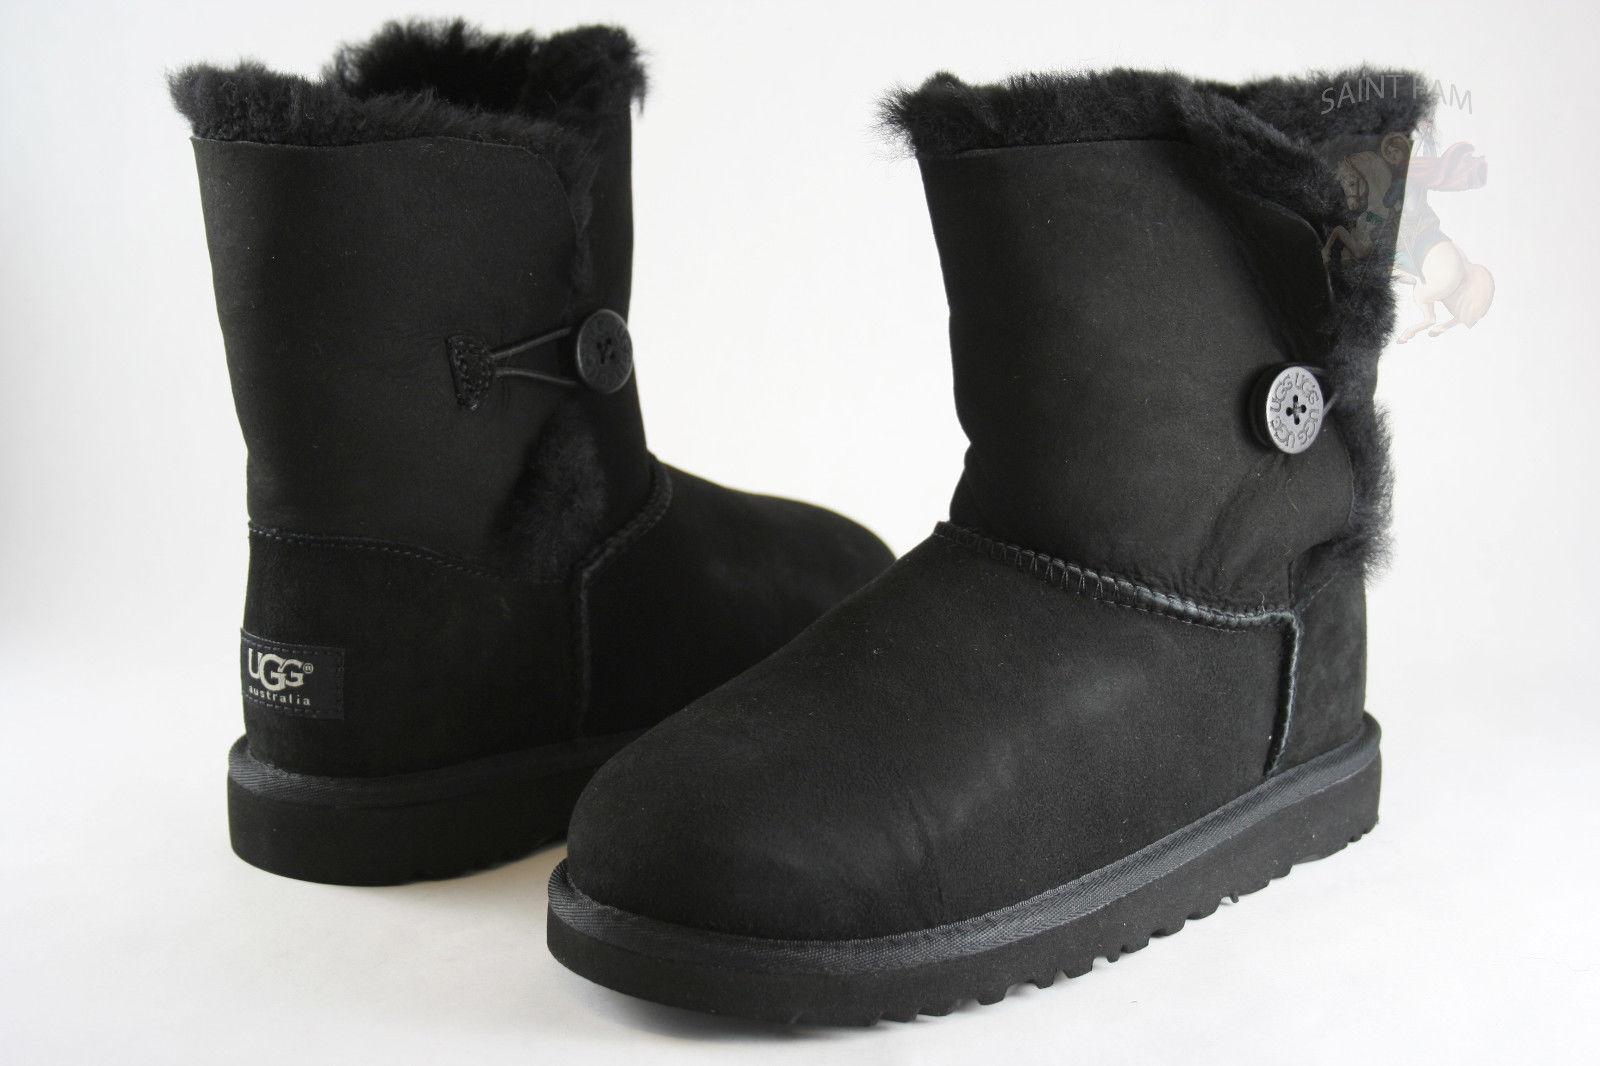 619170bbd2f Toddler UGG Australia Bailey Button Boot 5991t Black 100 Original 7